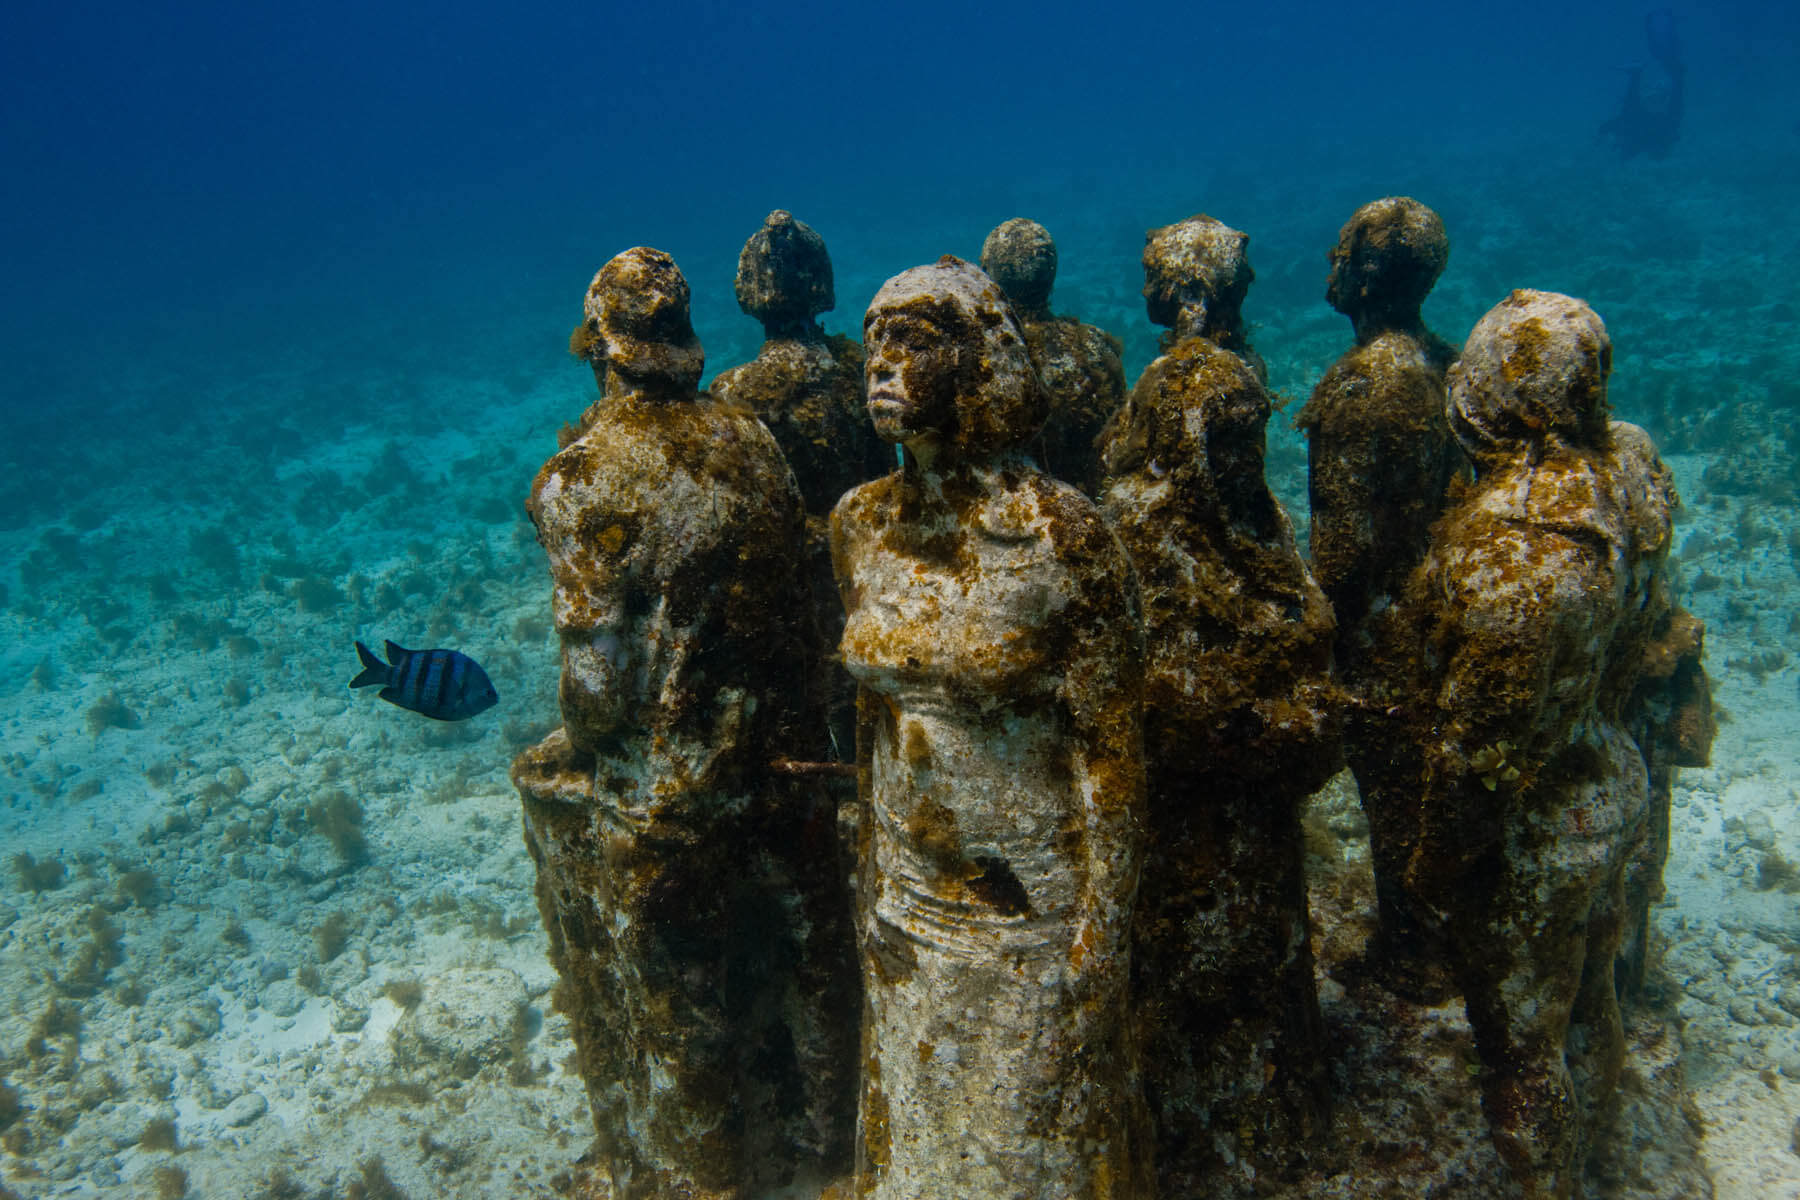 silent-evolution-ii-sculptures-musa-jason-decaires-taylor